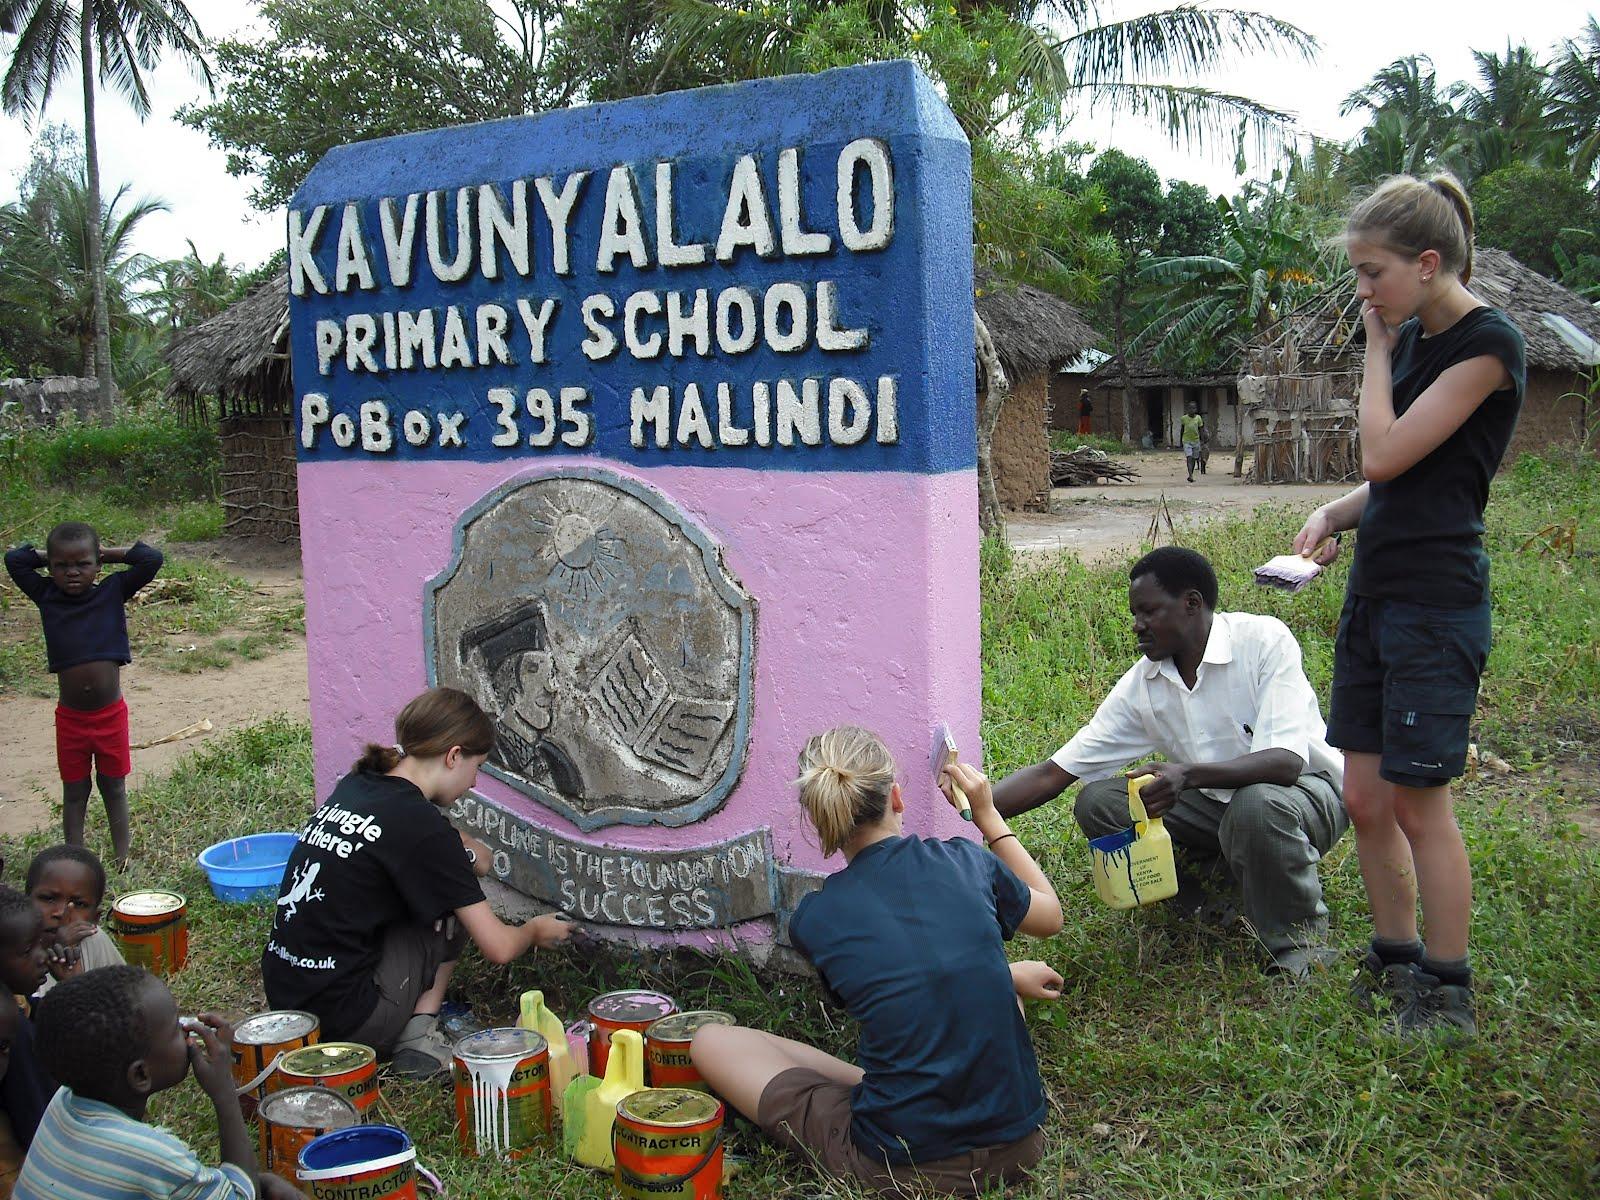 Kavunyalalo School